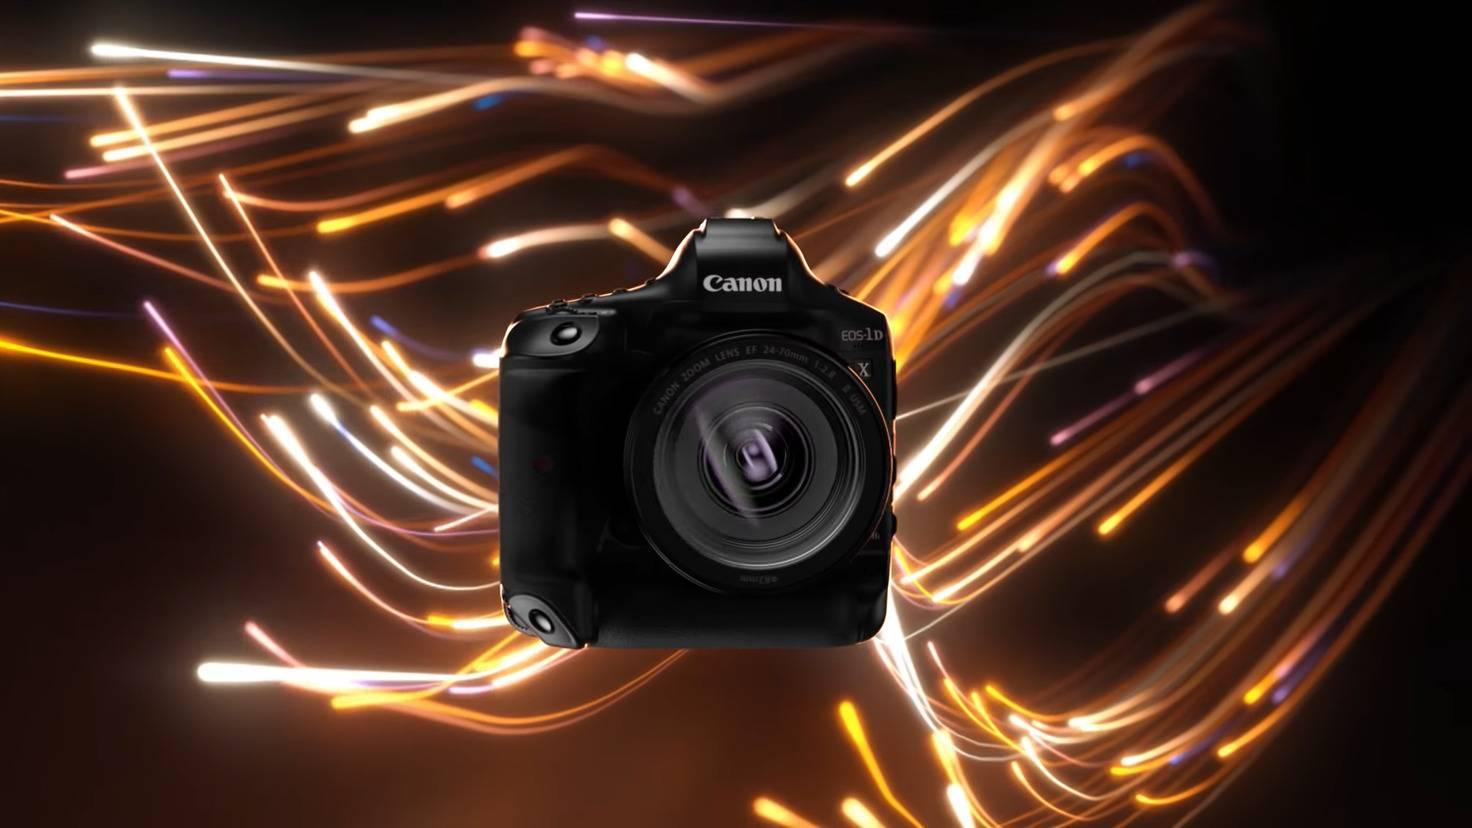 Canon 1D X-Mark 3 DSLR